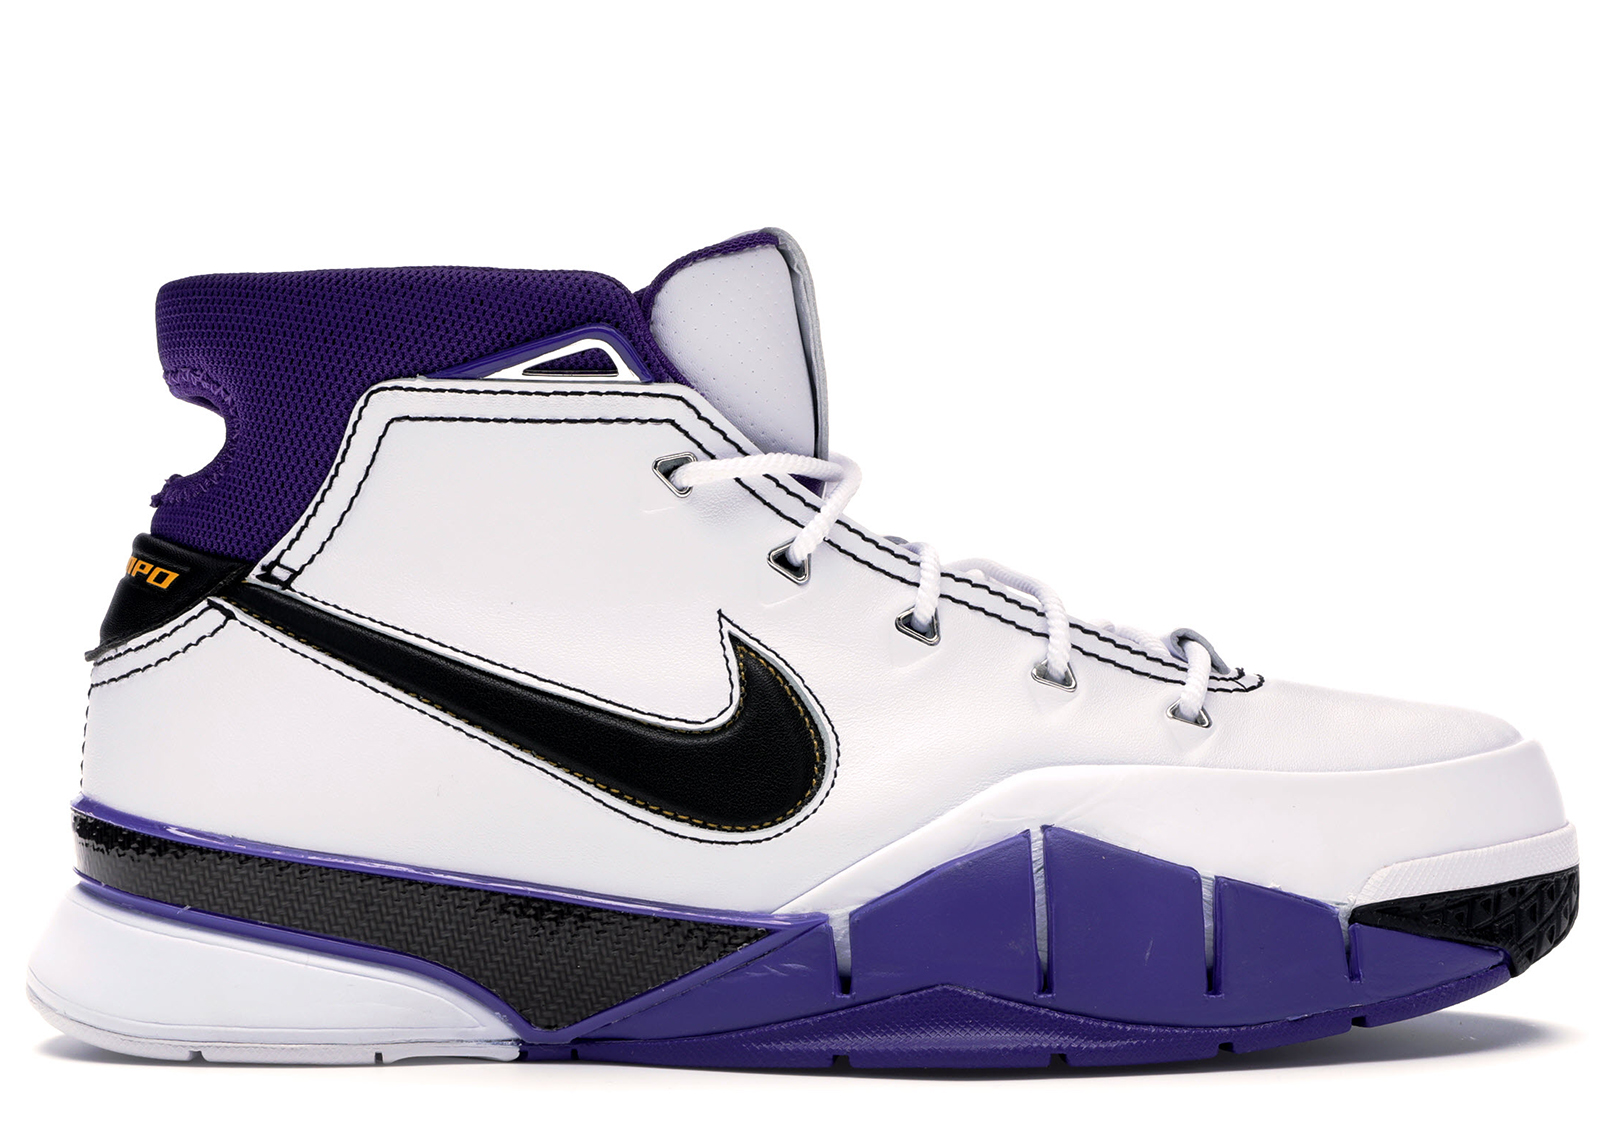 Nike Kobe 1 Protro 81 Pt Game - AQ2728-105